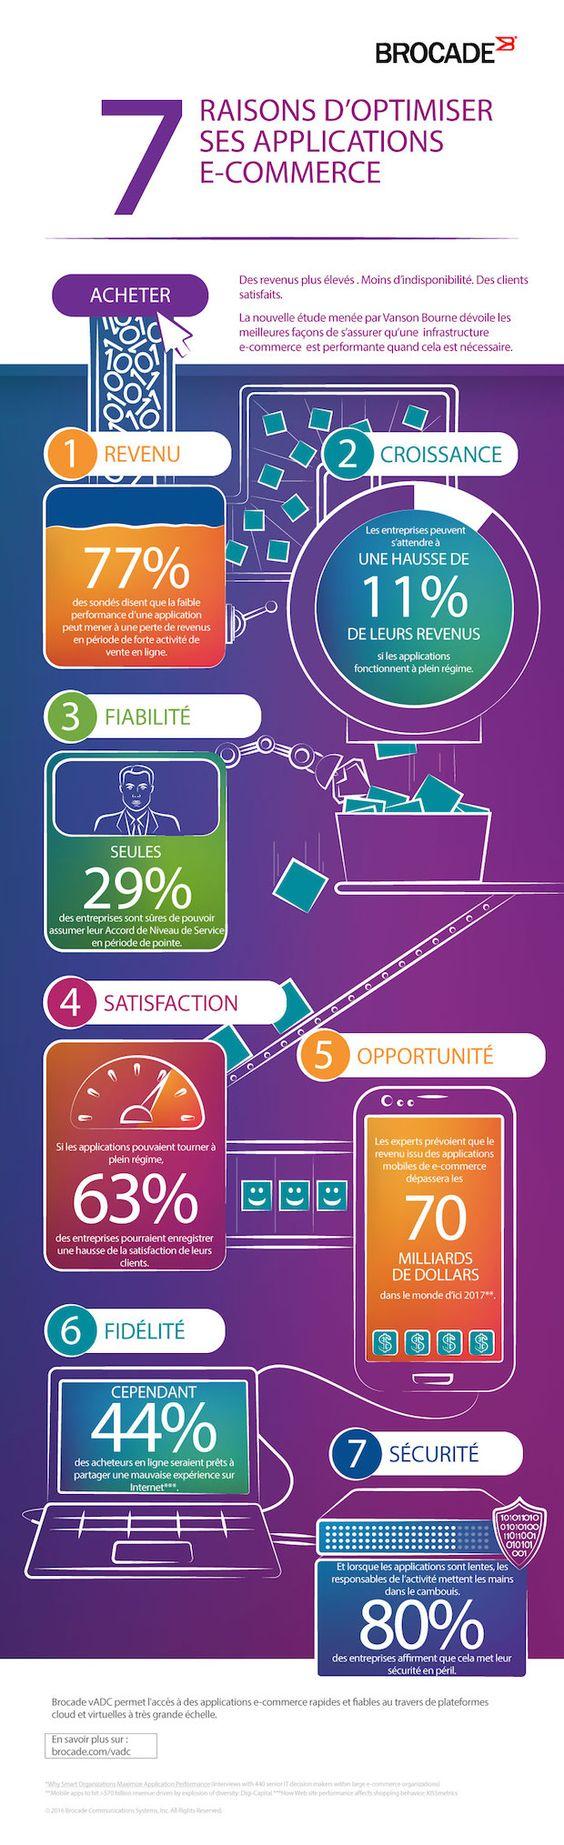 Applications e-commerce